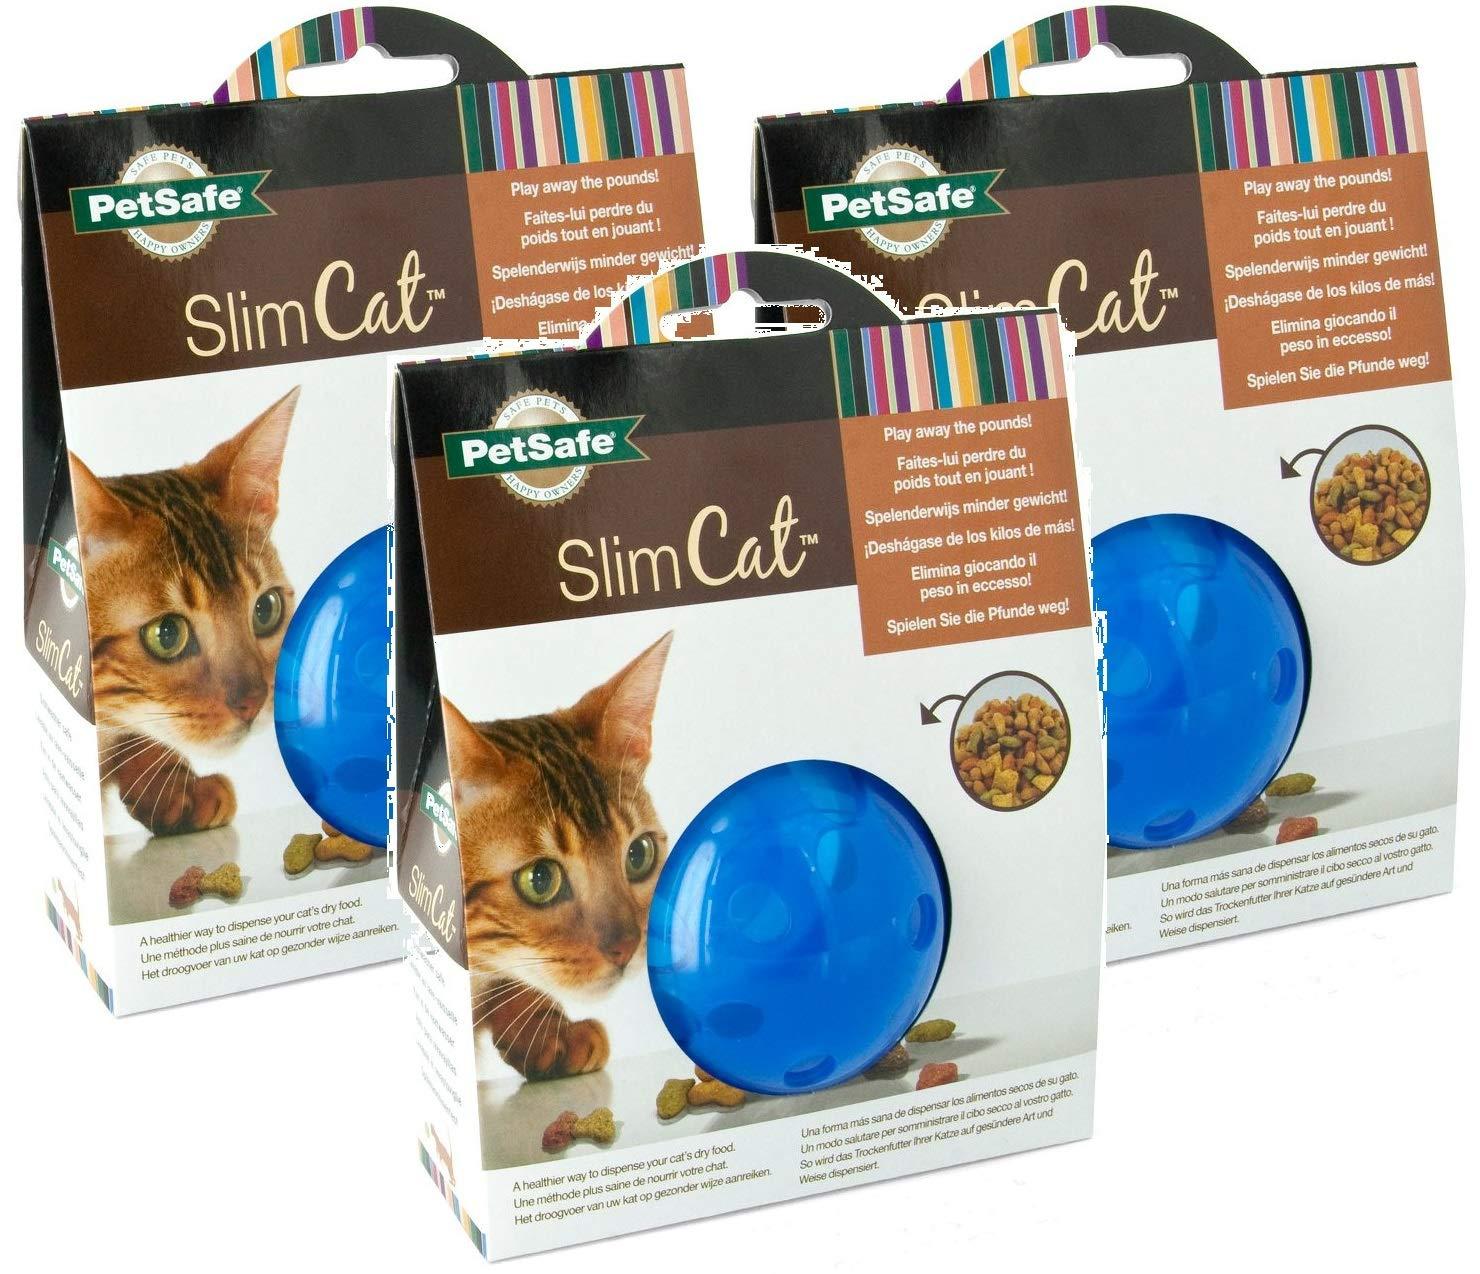 PetSafe slimcat comida dispensador gato juguete, azul (3 Pack): Amazon.es: Hogar